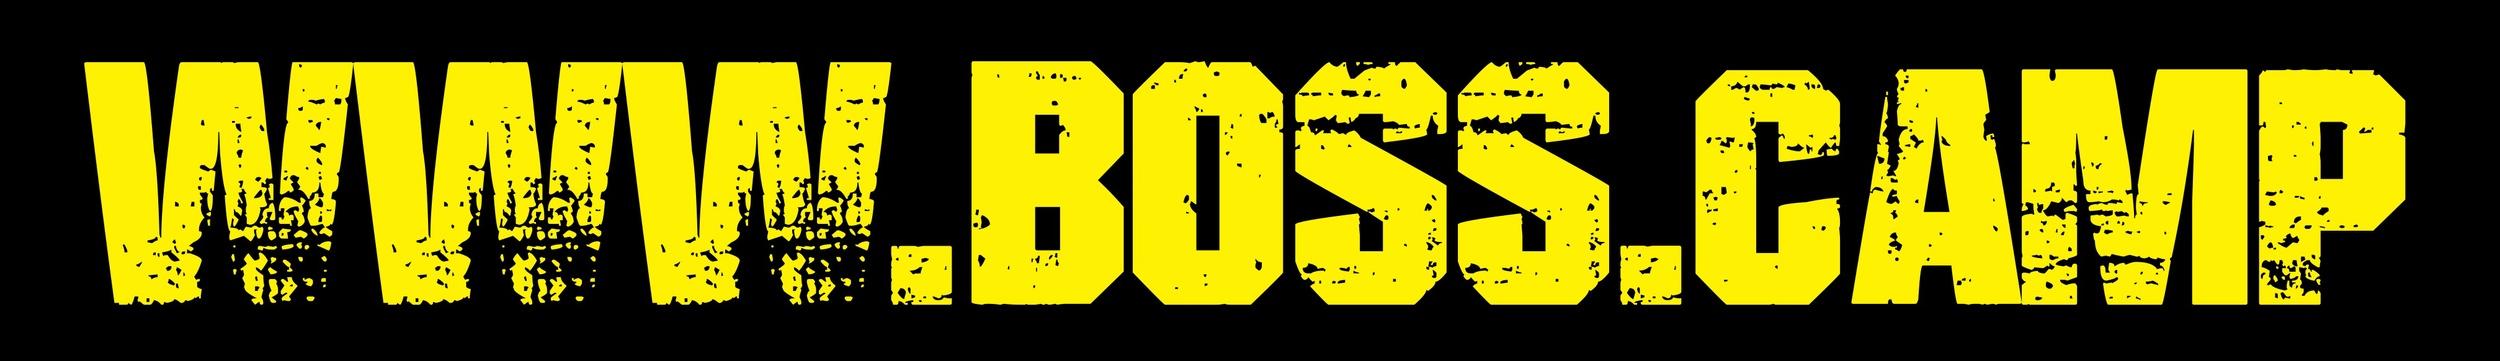 Get better employee performance with www.boss.camp Jpeg